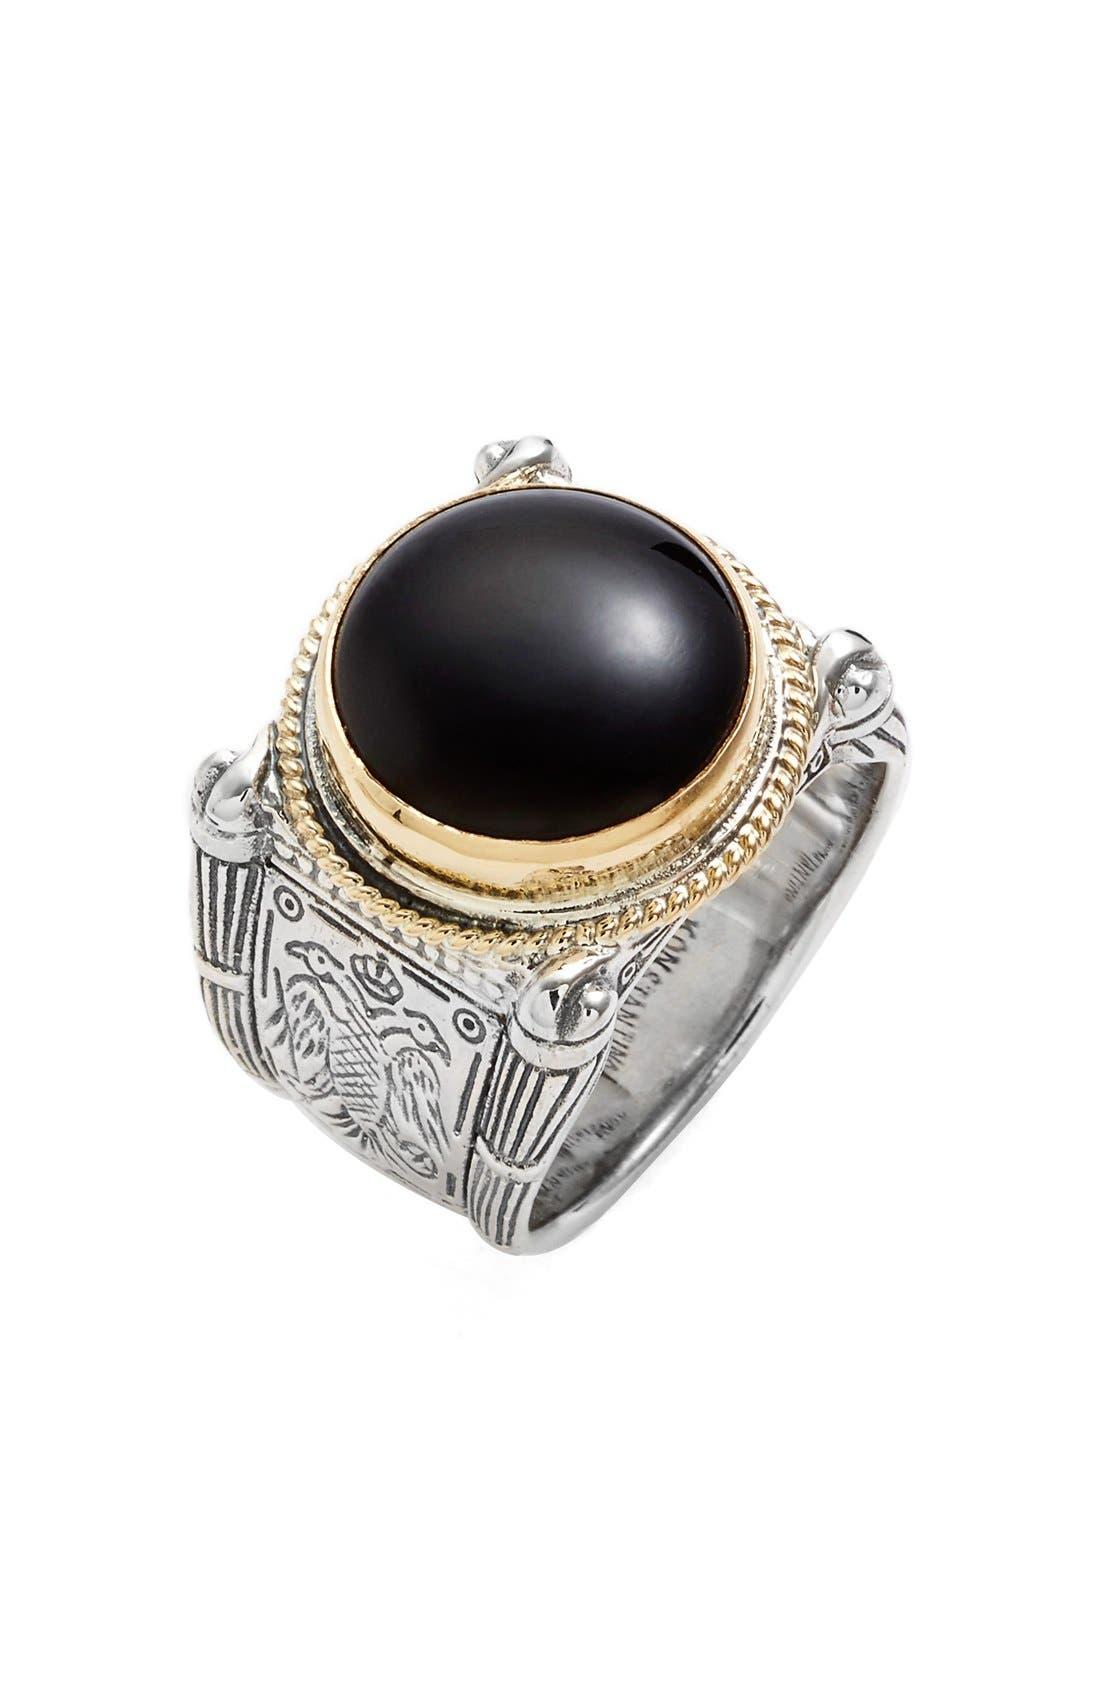 Konstantino 'Minos' Etched Black Onyx Ring